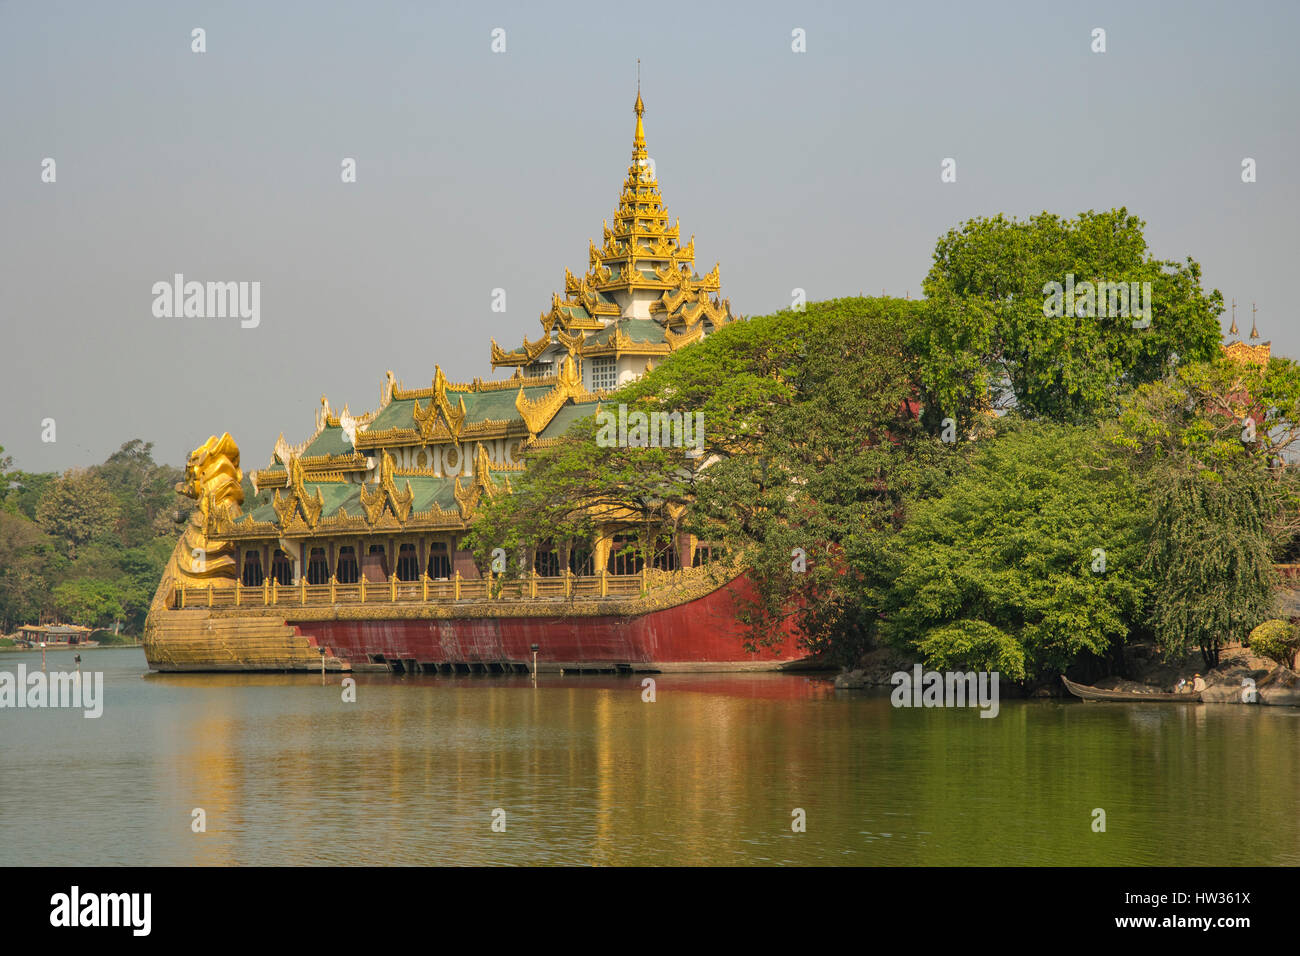 Karaweik Royal Barge, Kandawgyi Lake, Yangon, Myanmar Stock Photo